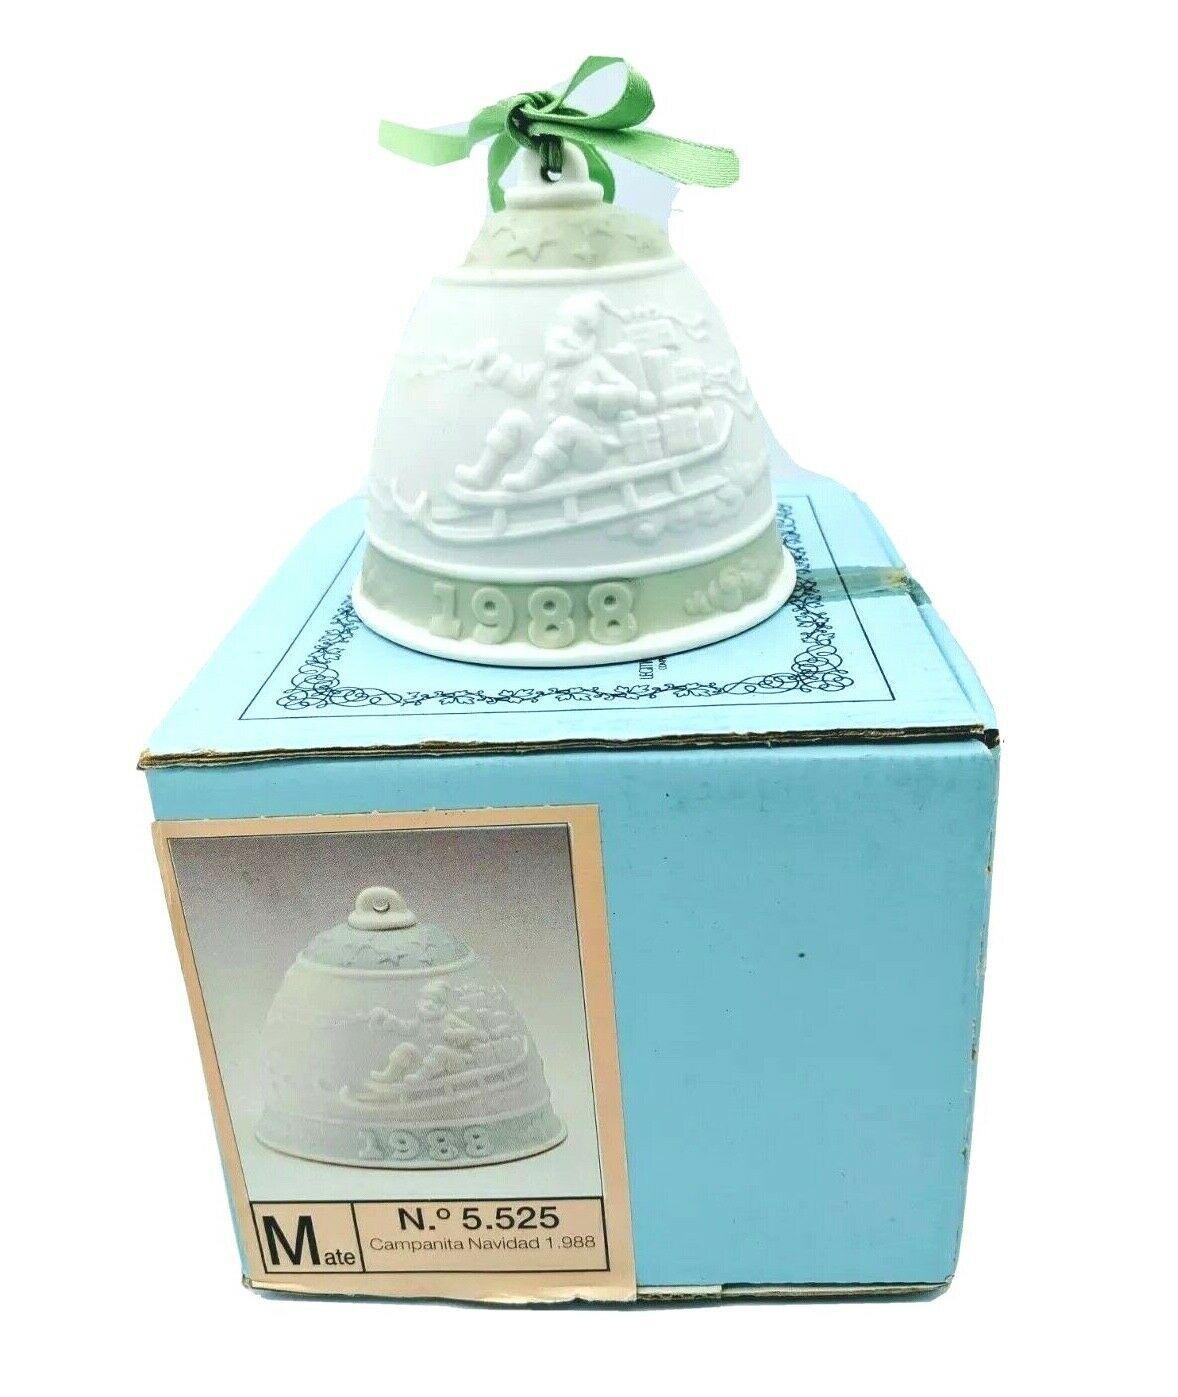 Lladro 1988 Porcelain Christmas Bell Ornament #5.525 Campanita Navidad Retired - $17.95